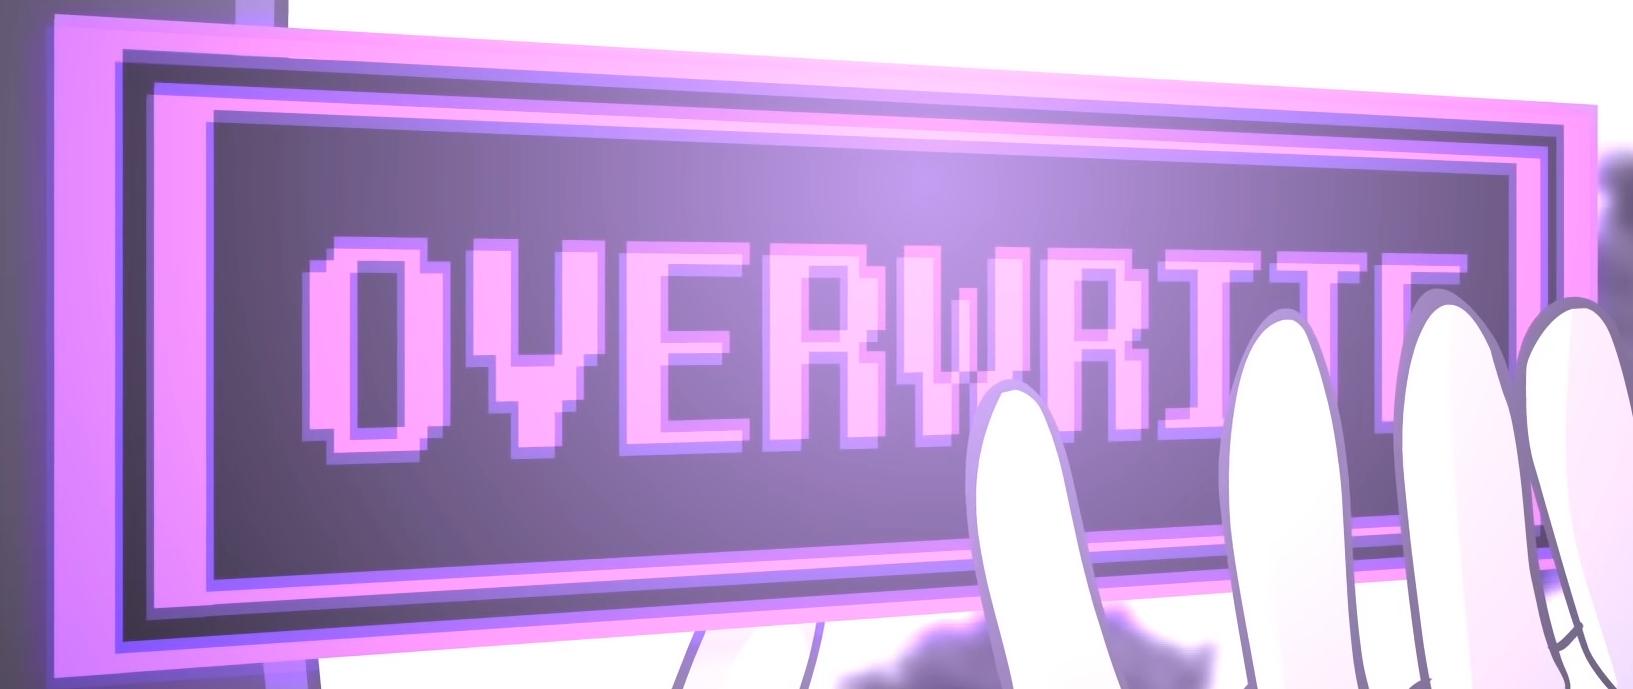 OVERWRITE